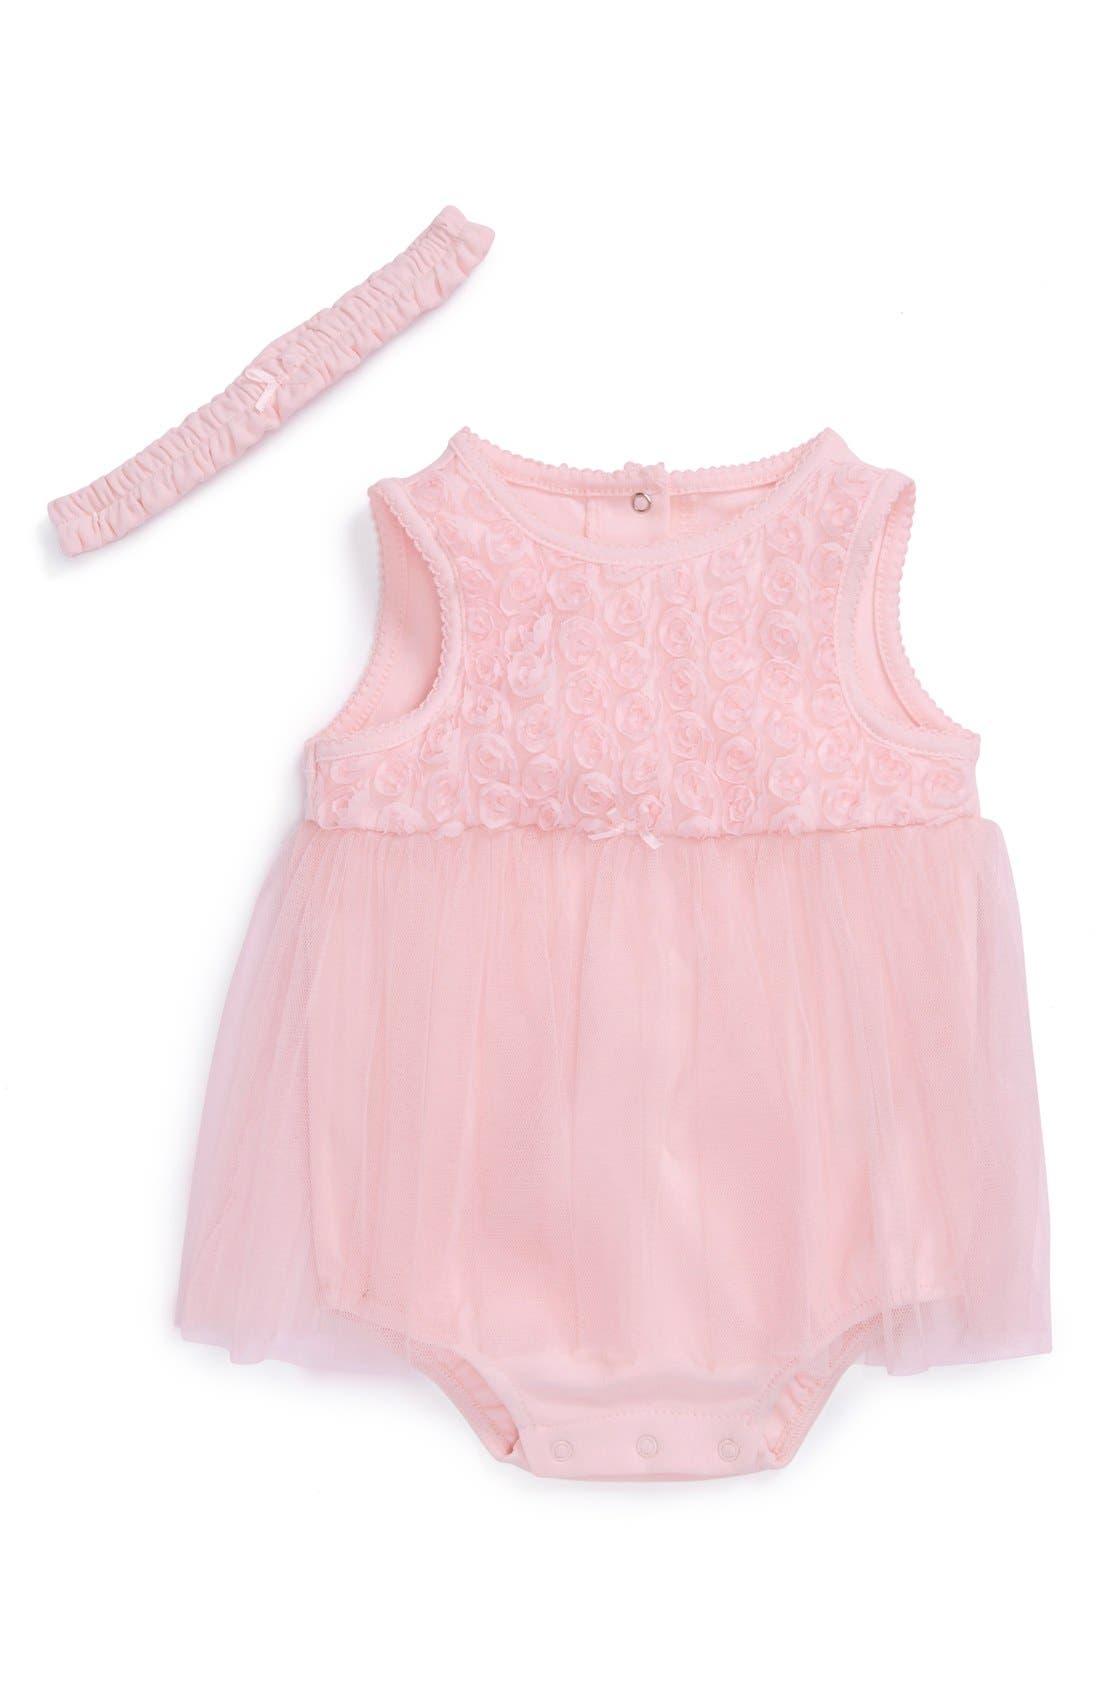 Main Image - Little Me 'Rose Tutu' Bodysuit & Headband (Baby Girls)